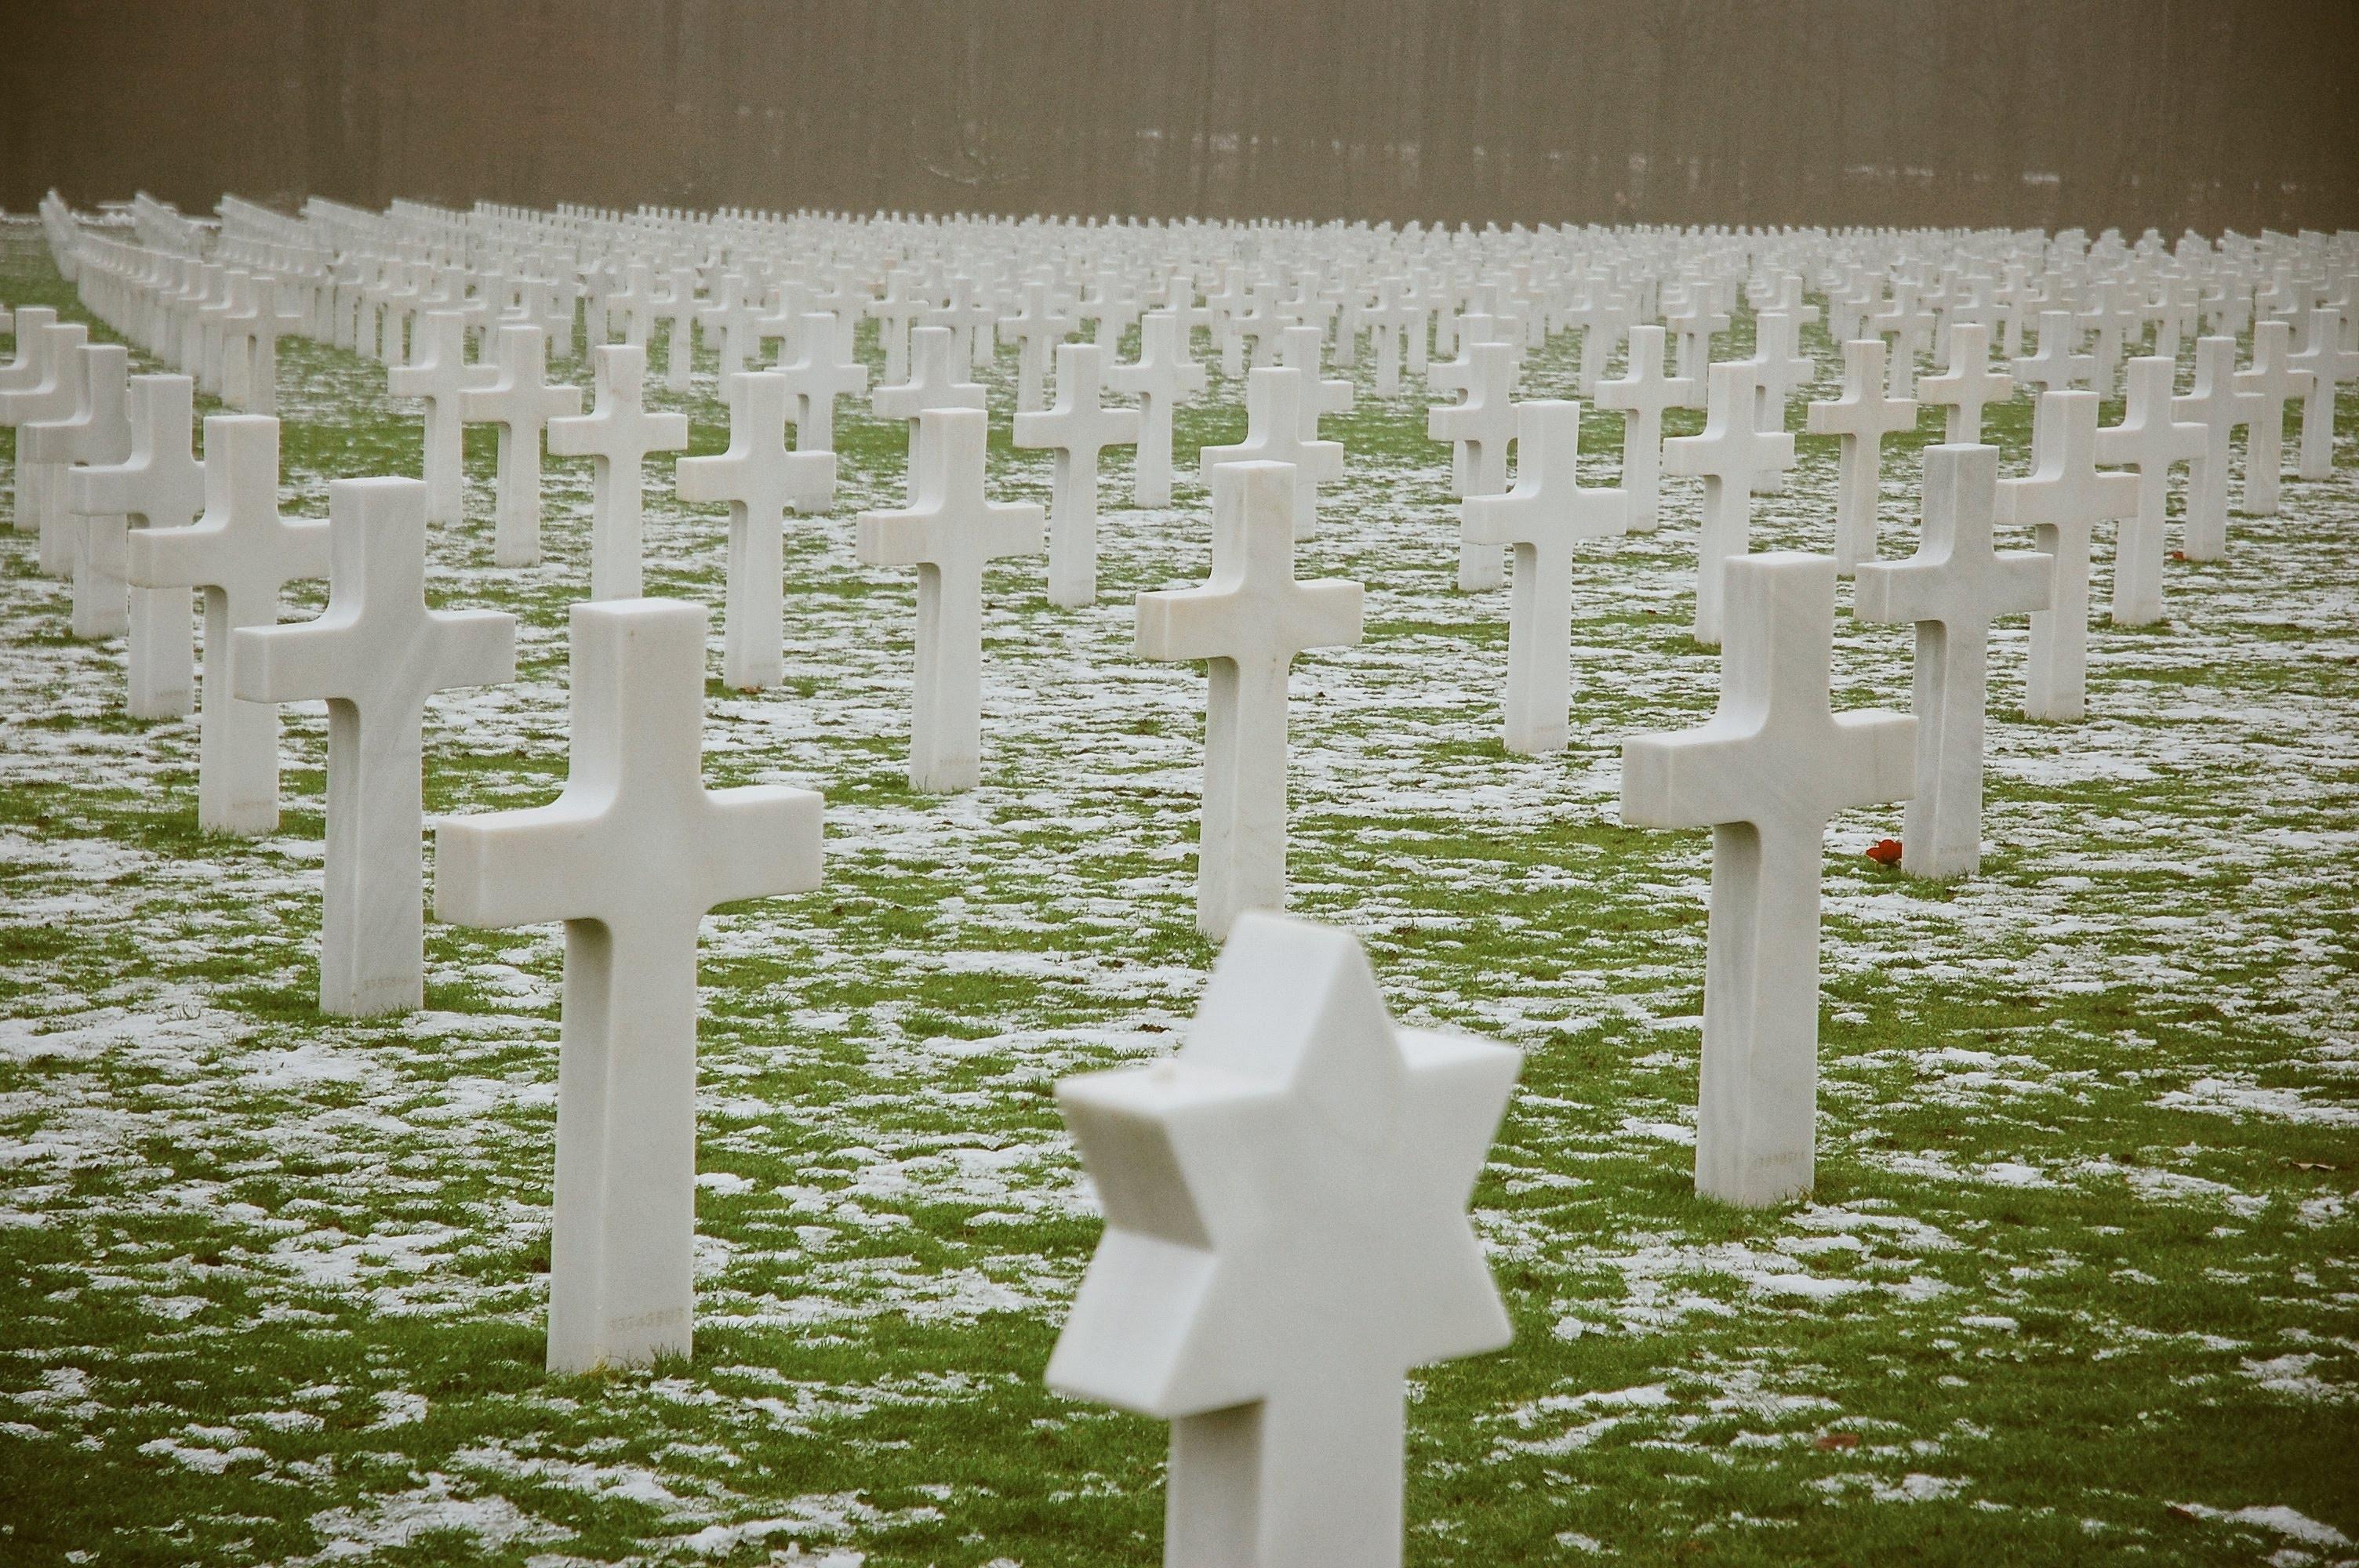 white concrete cross tomb on green grass field